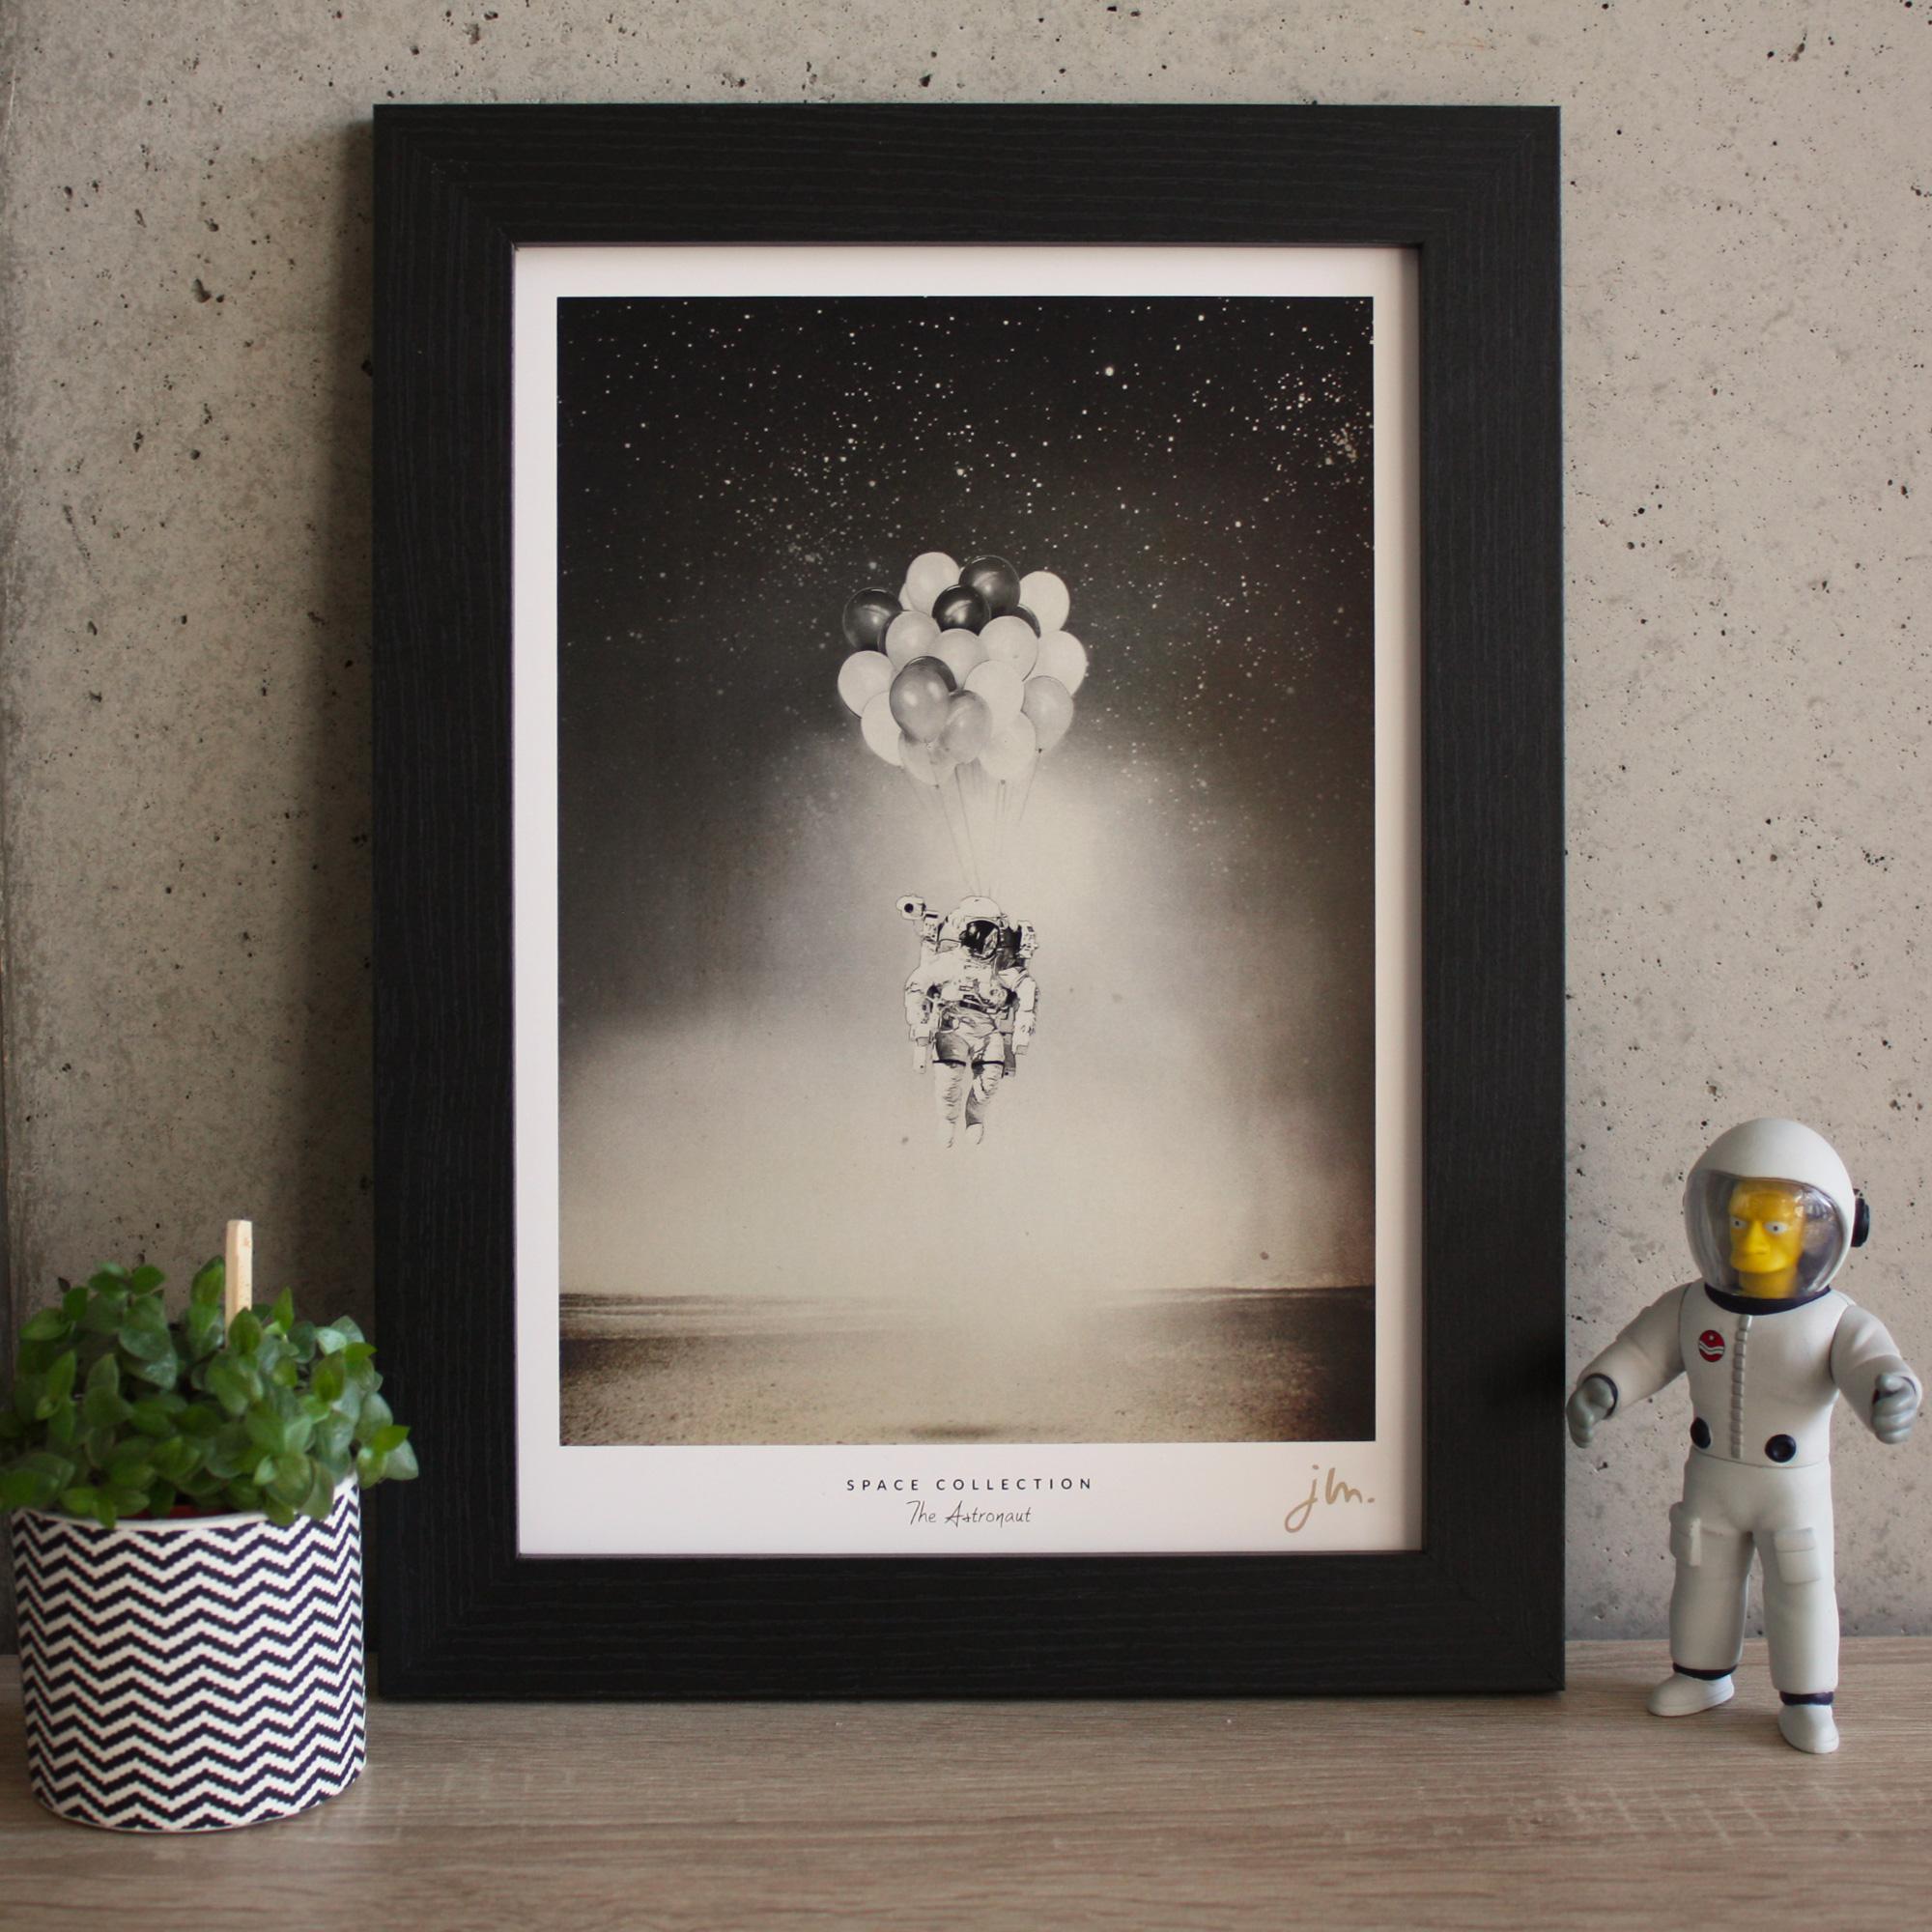 Affiche Fine Art The Astronaut - Edition Silver